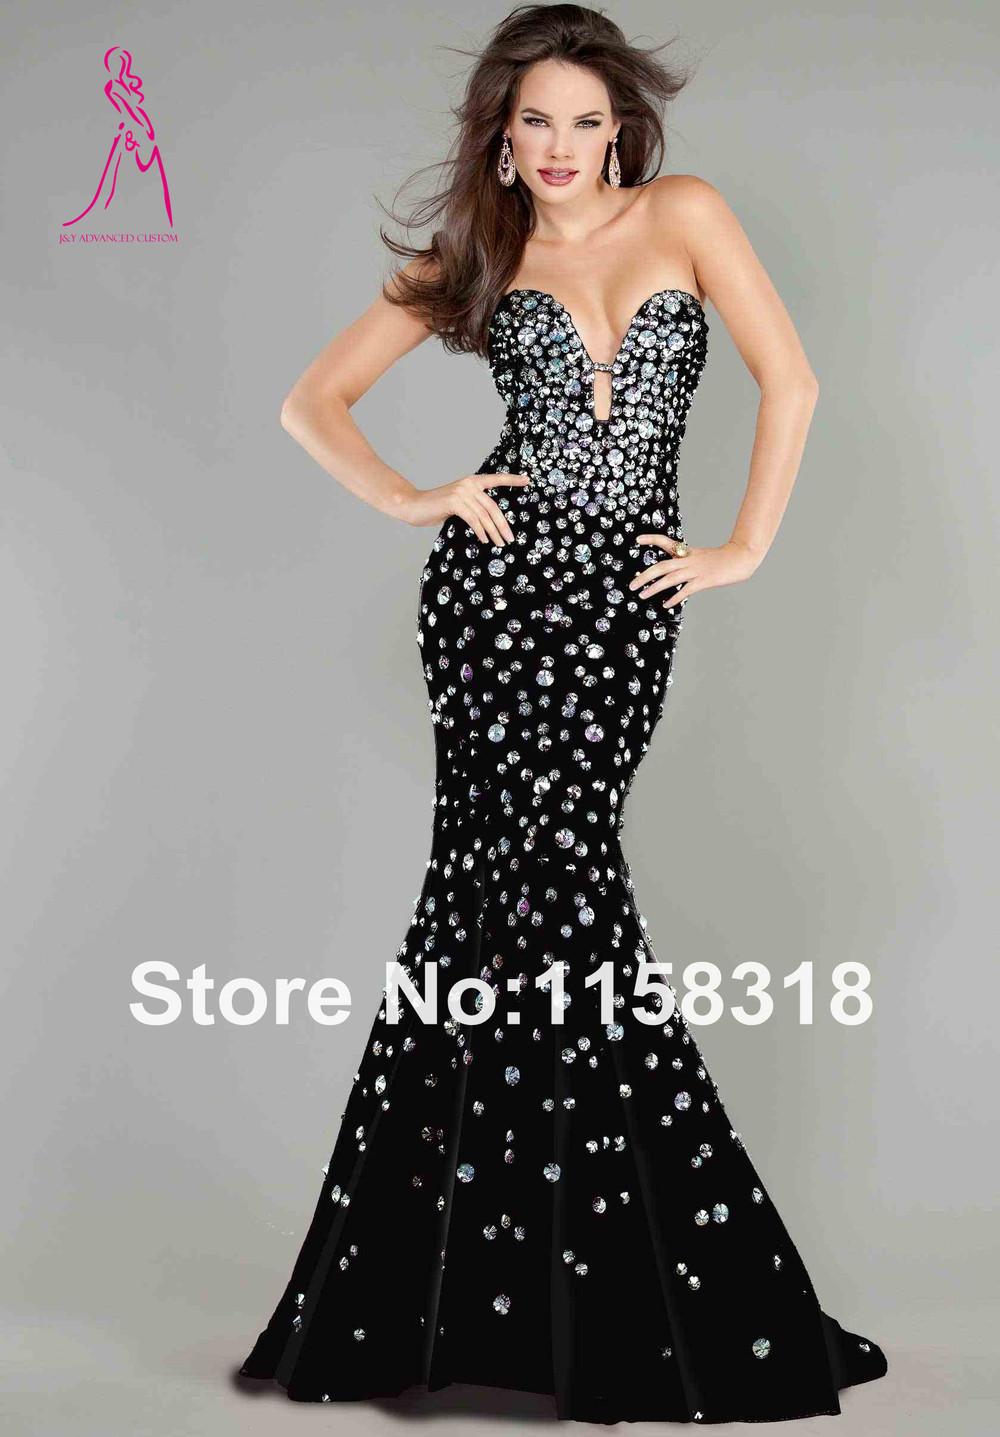 White Mermaid Prom Dresses for Rent | Dress images